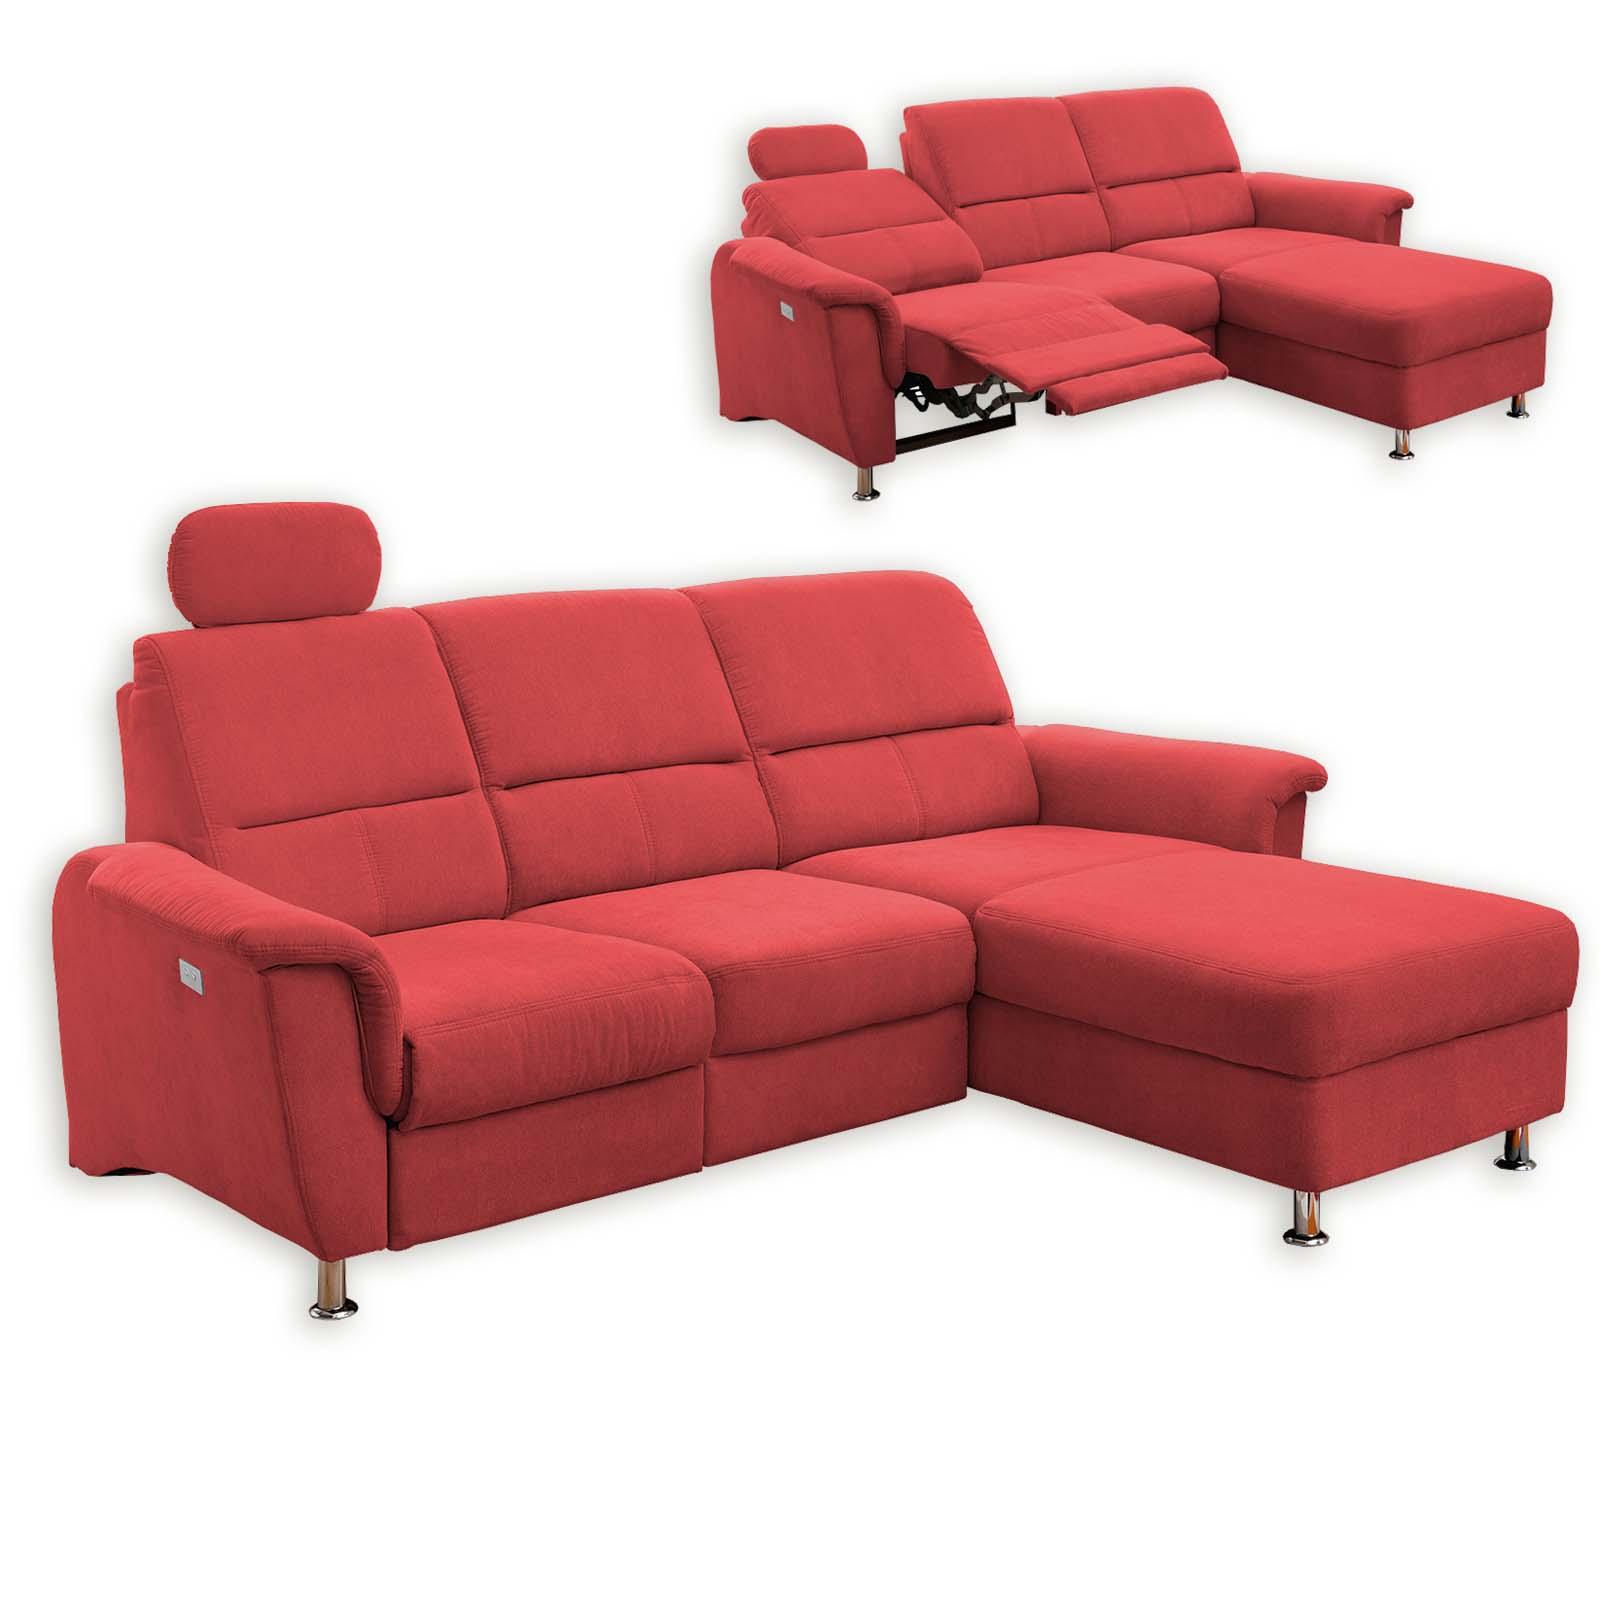 Sofa Mit Recamiere Und Relaxfunktion - Caseconrad.com